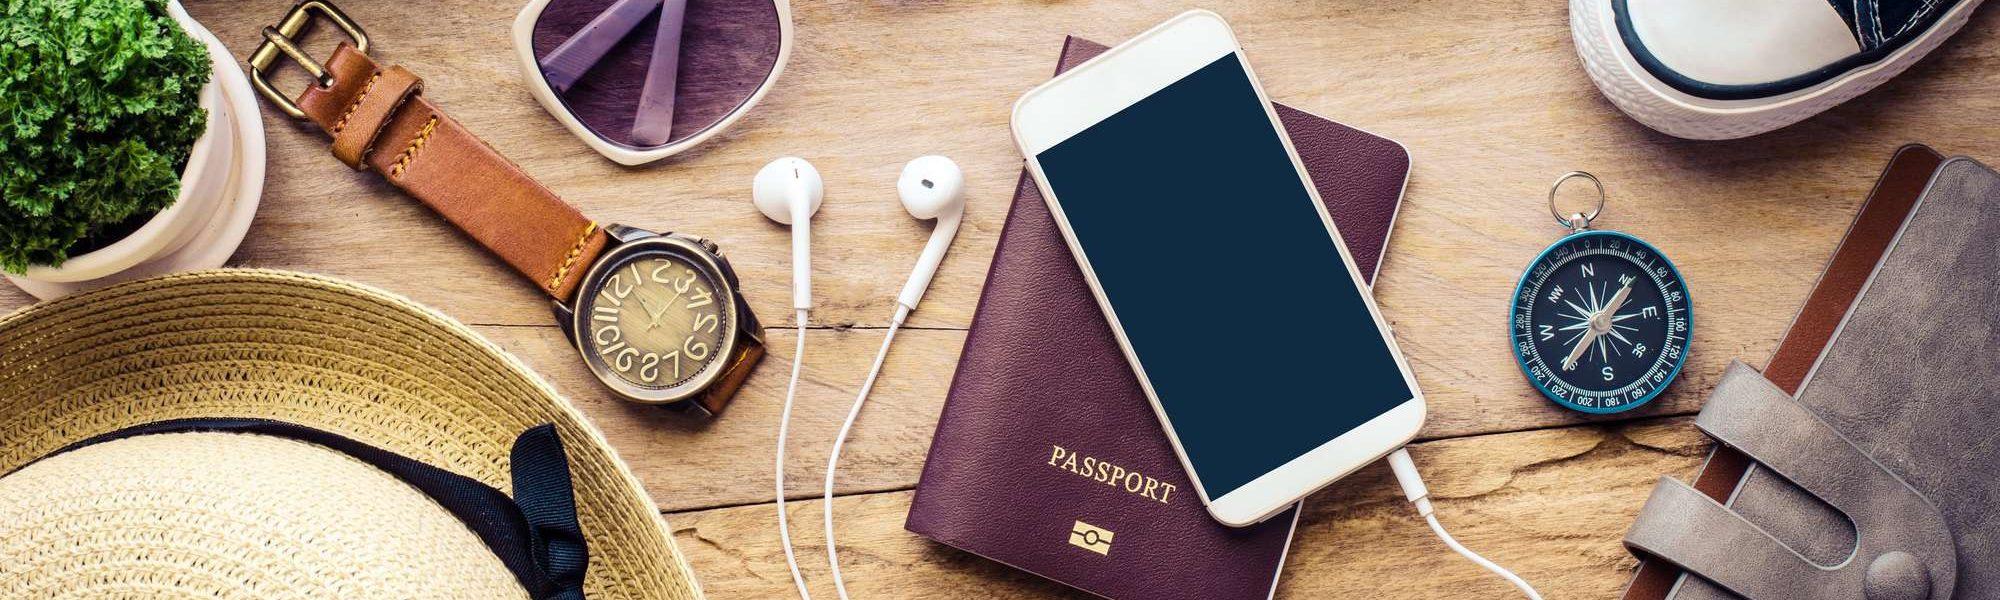 passport, ID phone, sunglasses, suitcase